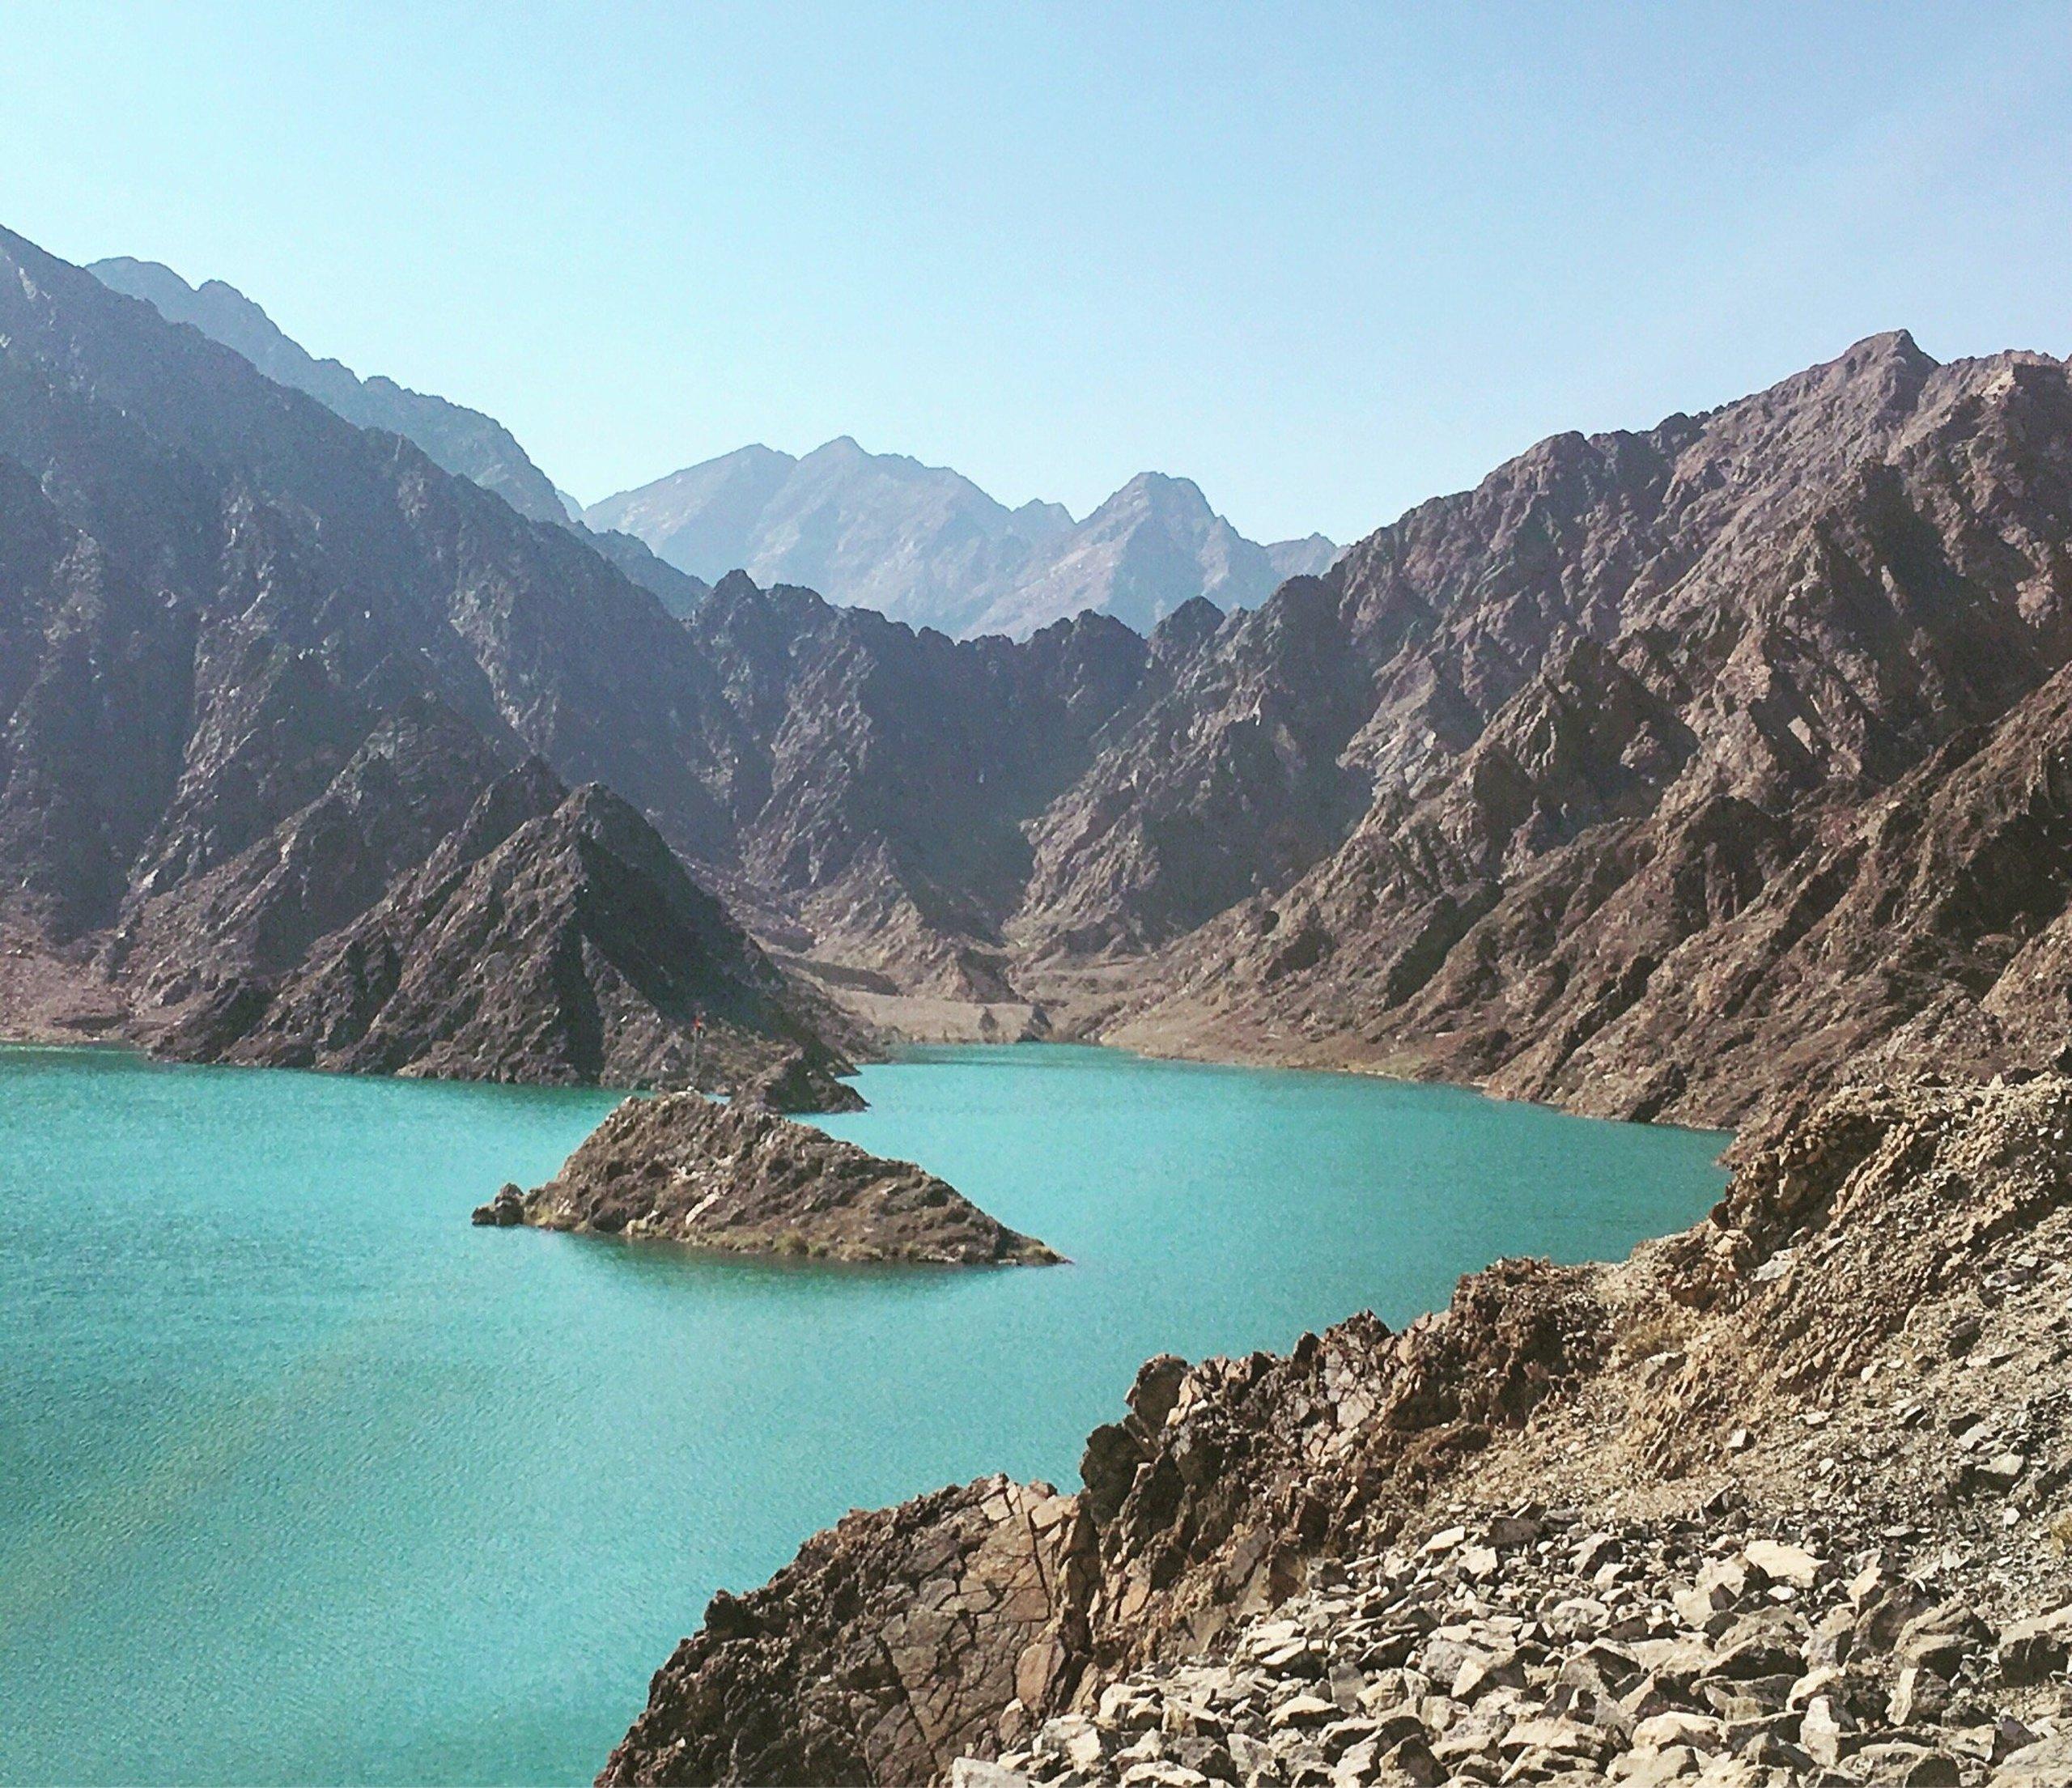 Hatta 2020 Best of Hatta United Arab Emirates Tourism